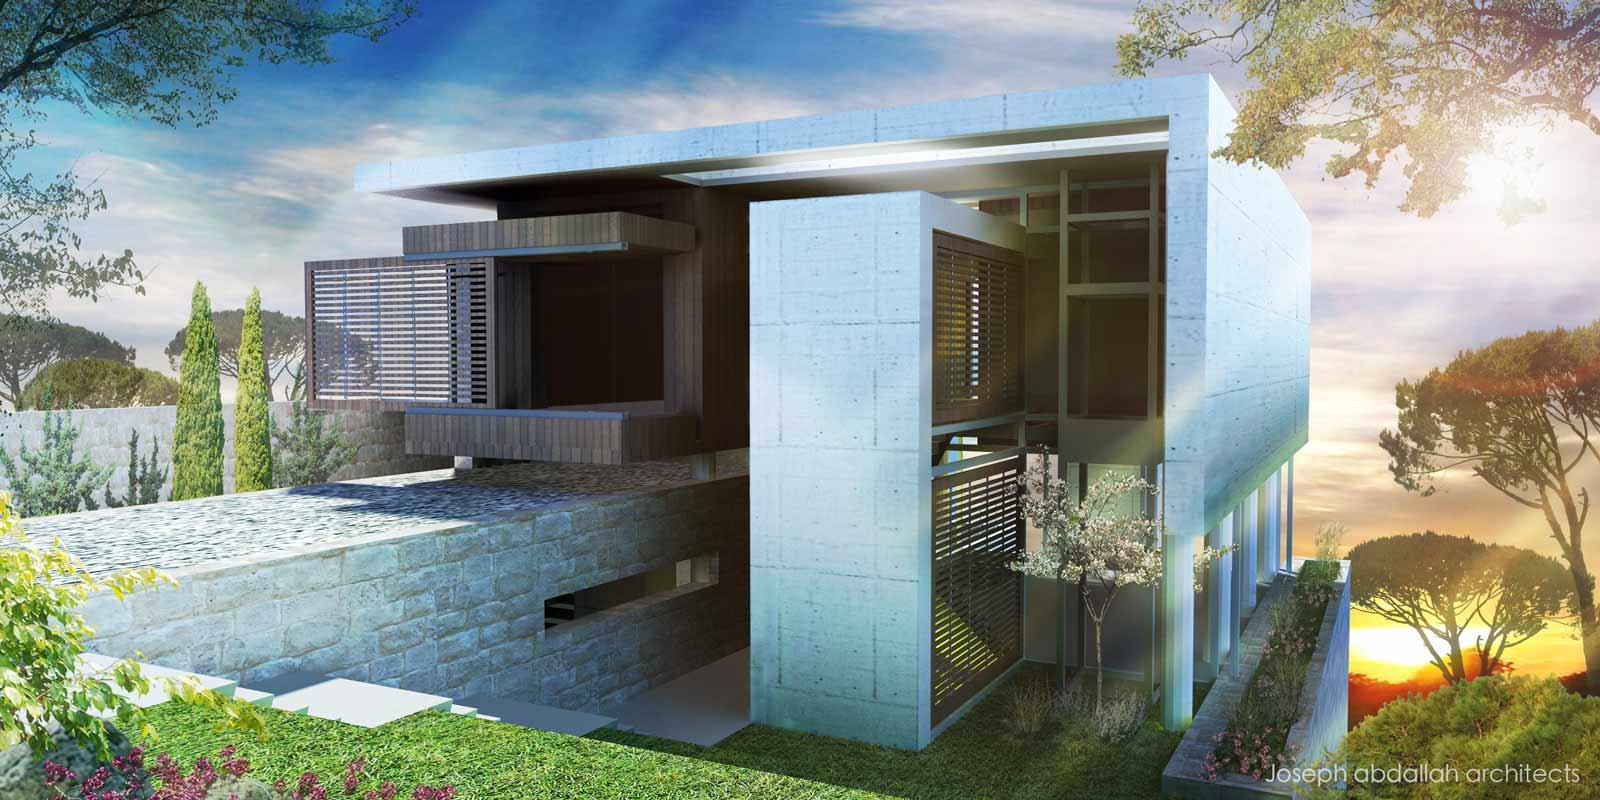 transparent-view-villa-modern-archiecture-joseph-abdallah-architects-1